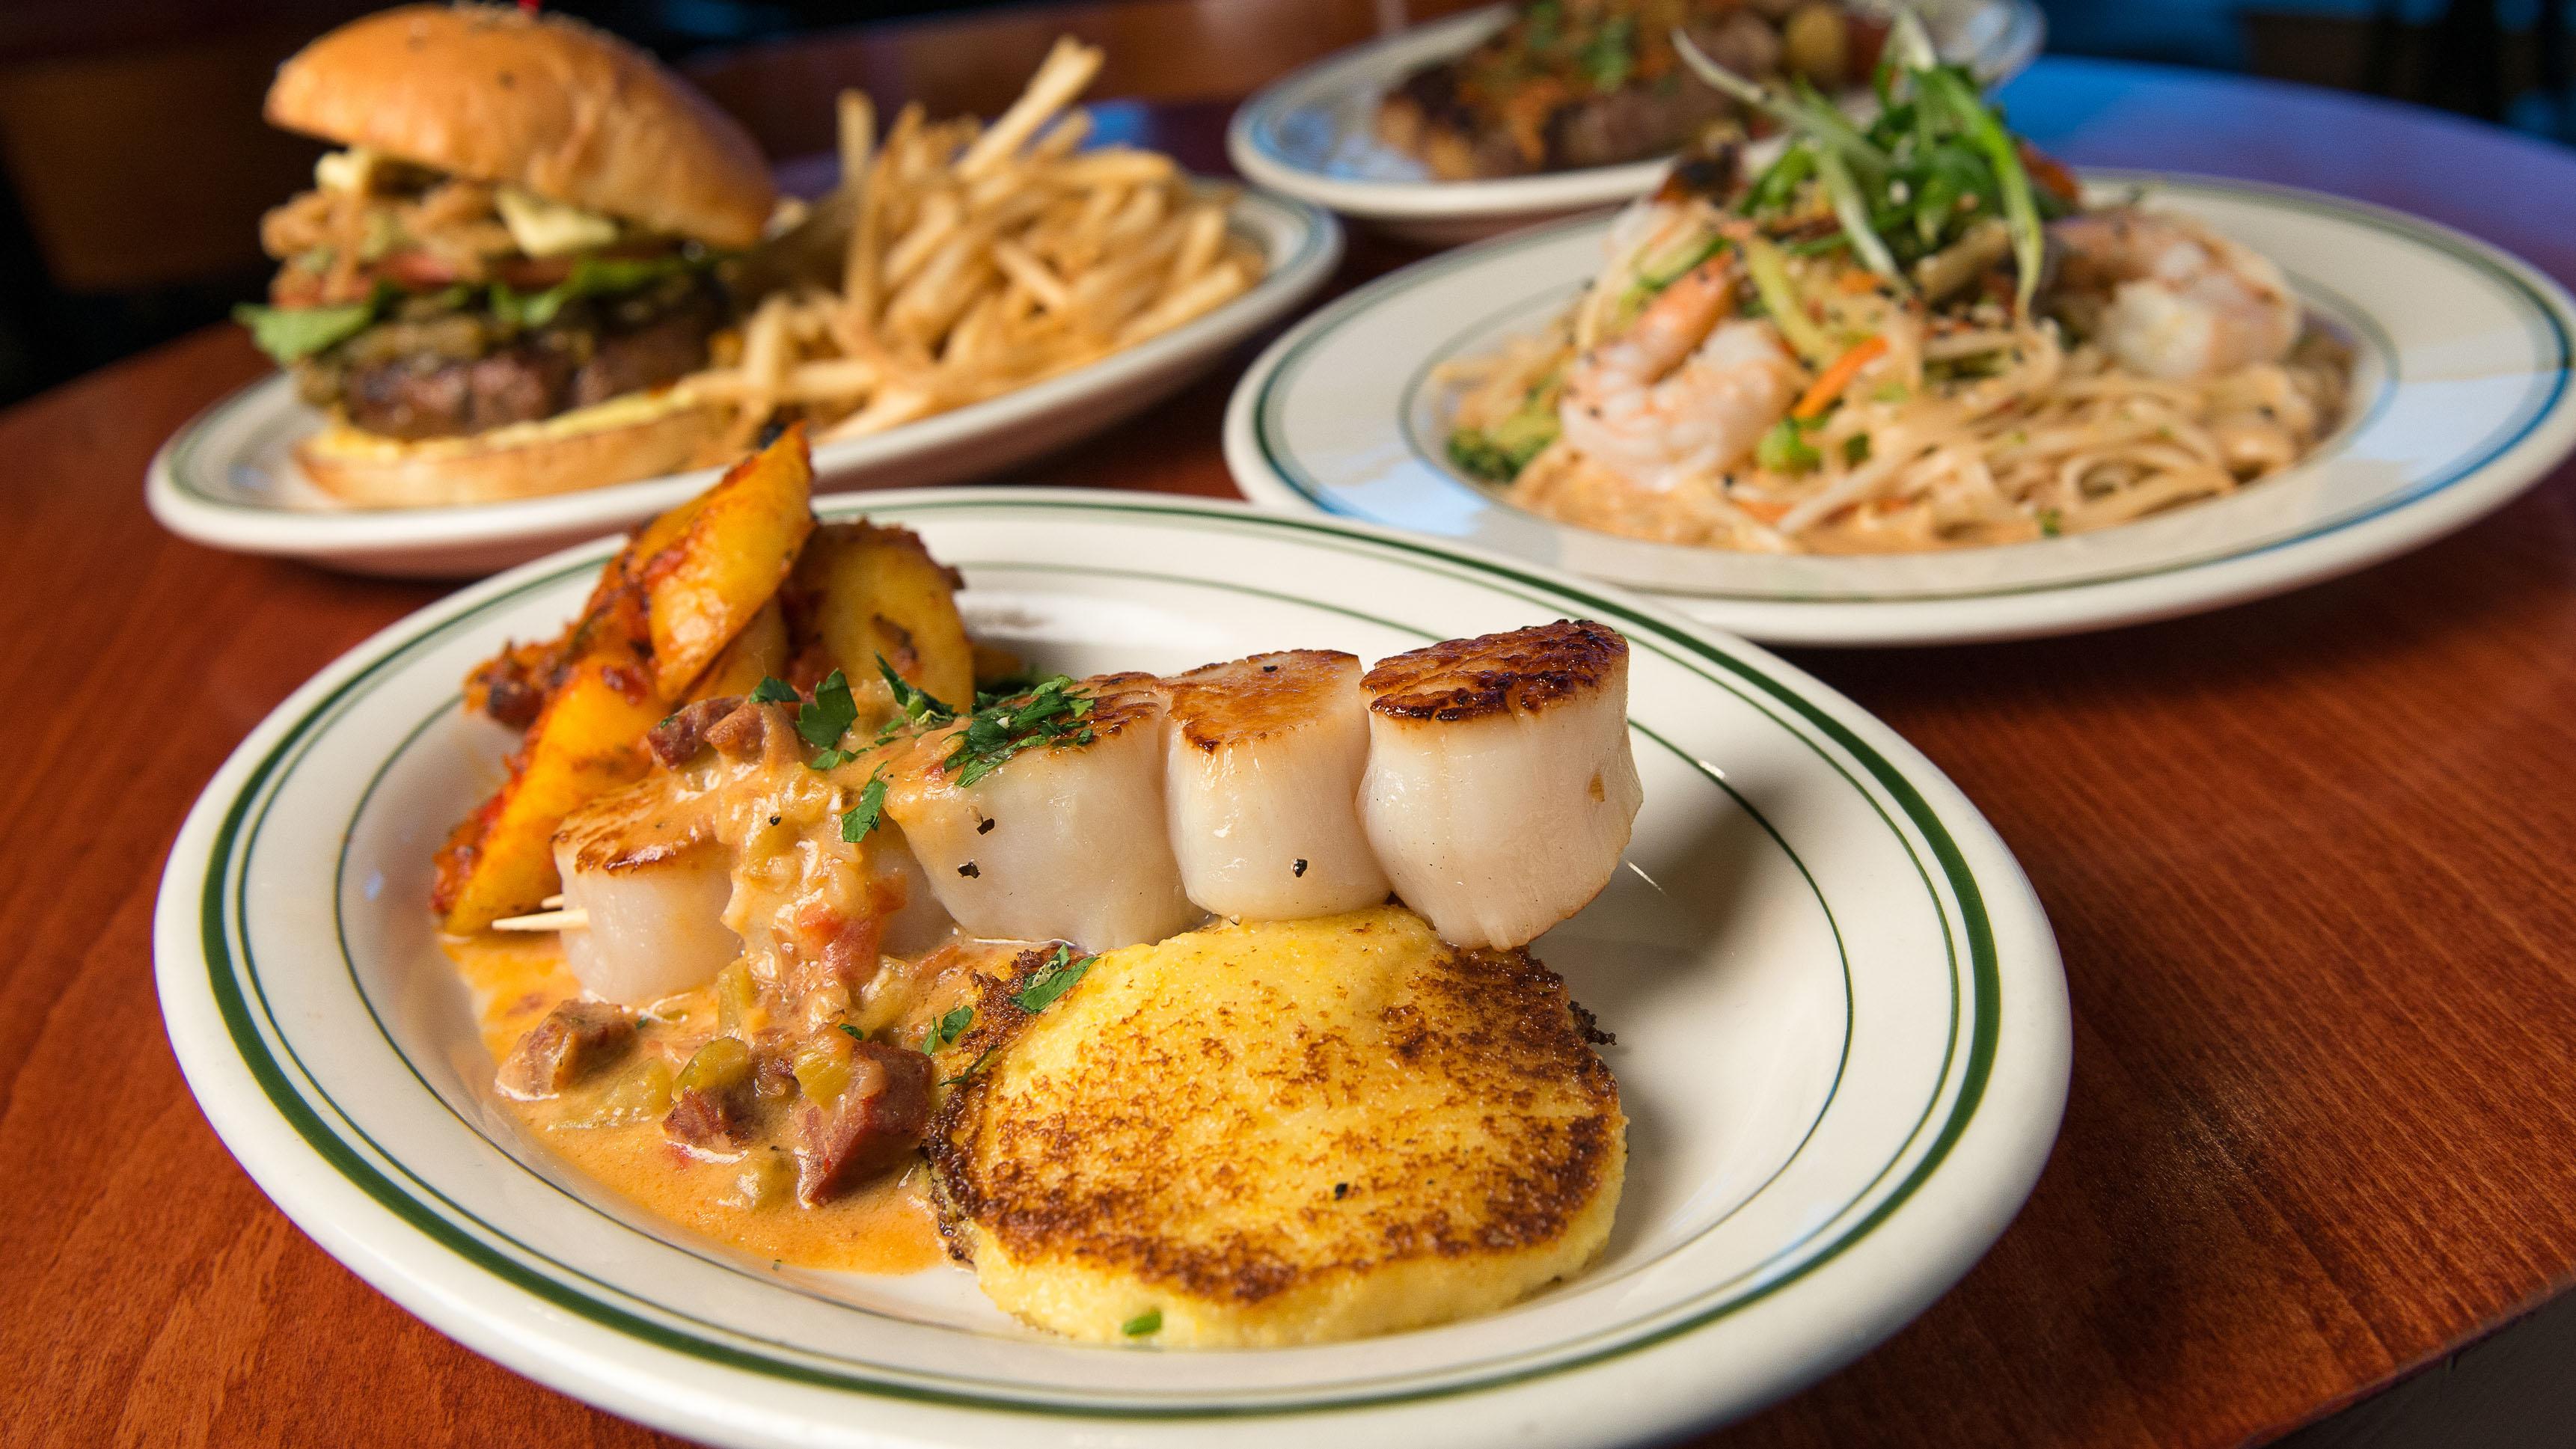 Best restaurants open late in Anchorage, AK - Yelp